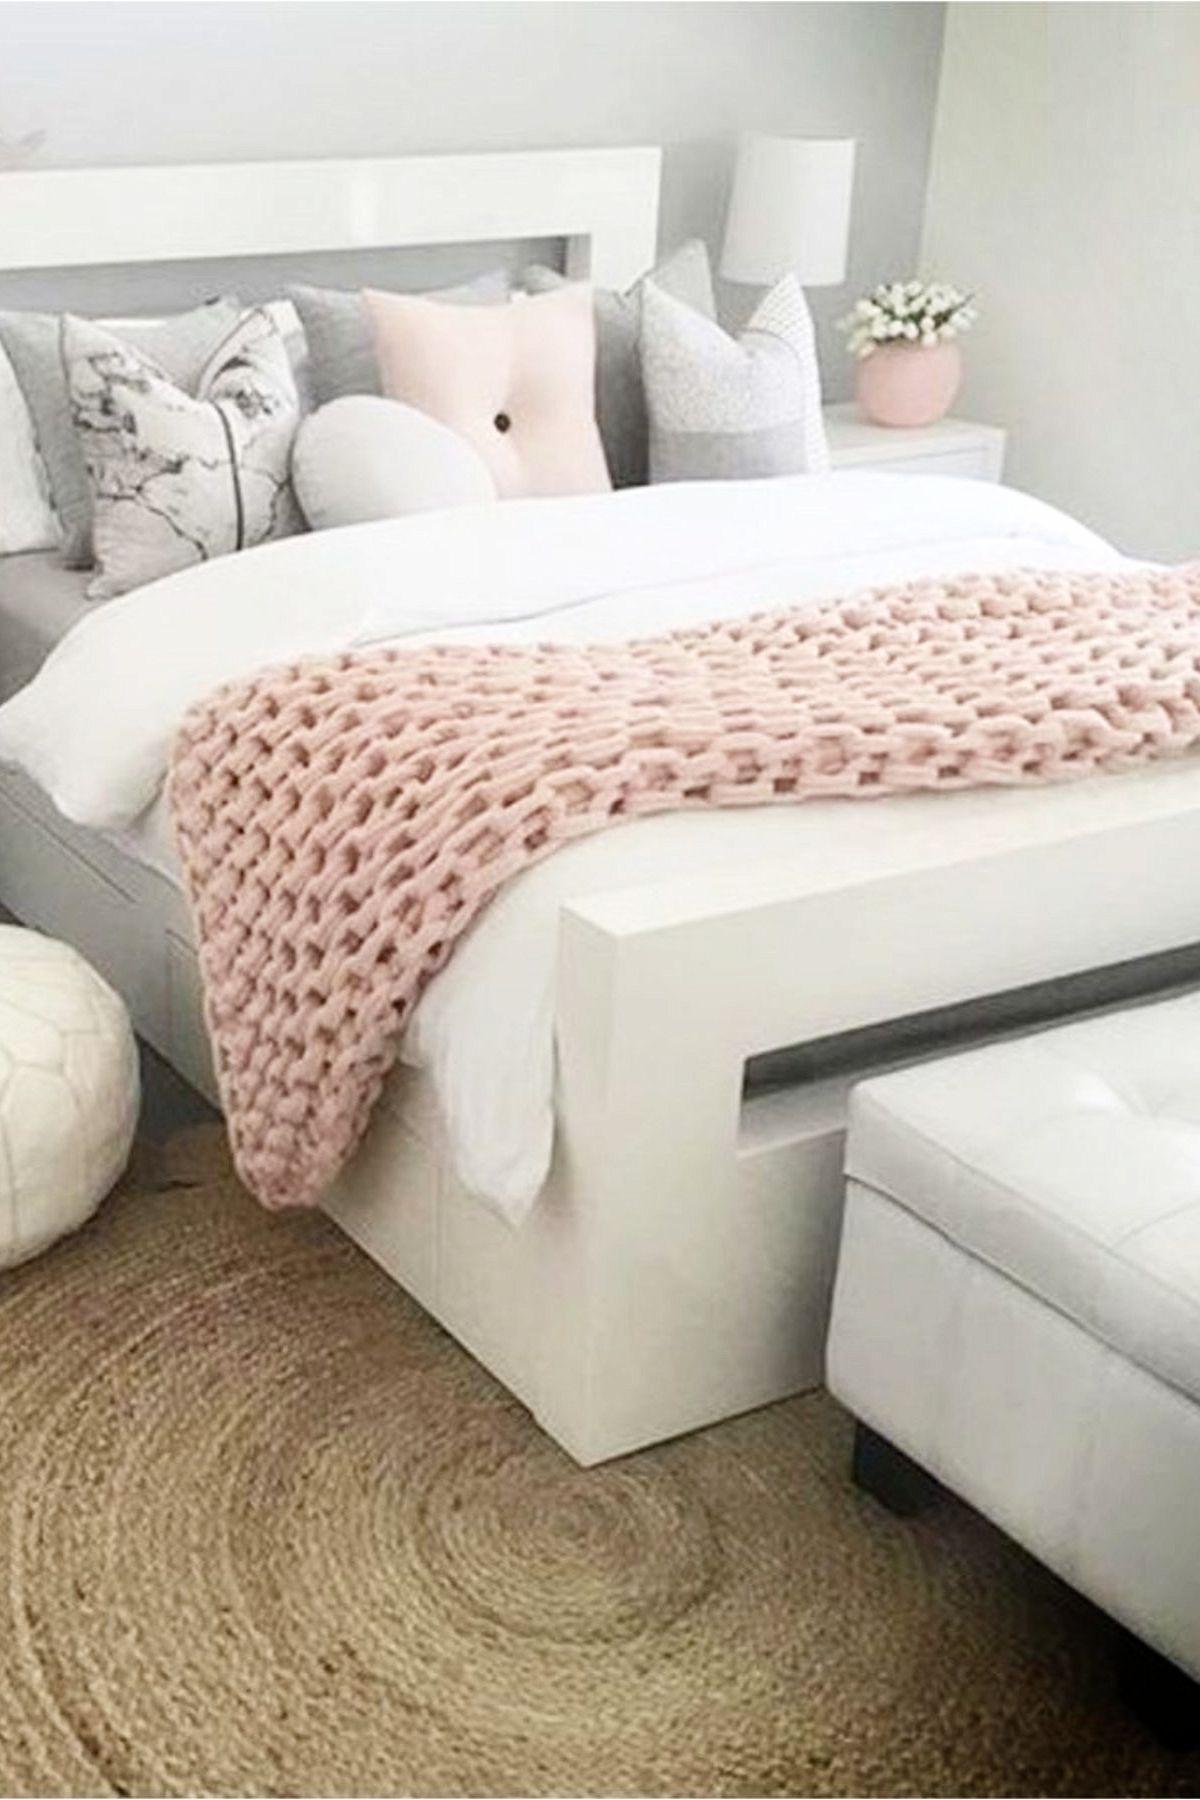 Blush Pink Bedroom Ideas Dusty Rose Bedroom Decor And Bedding I Love Pink Bedroom Decor Dusty Pink Bedroom Rose Bedroom